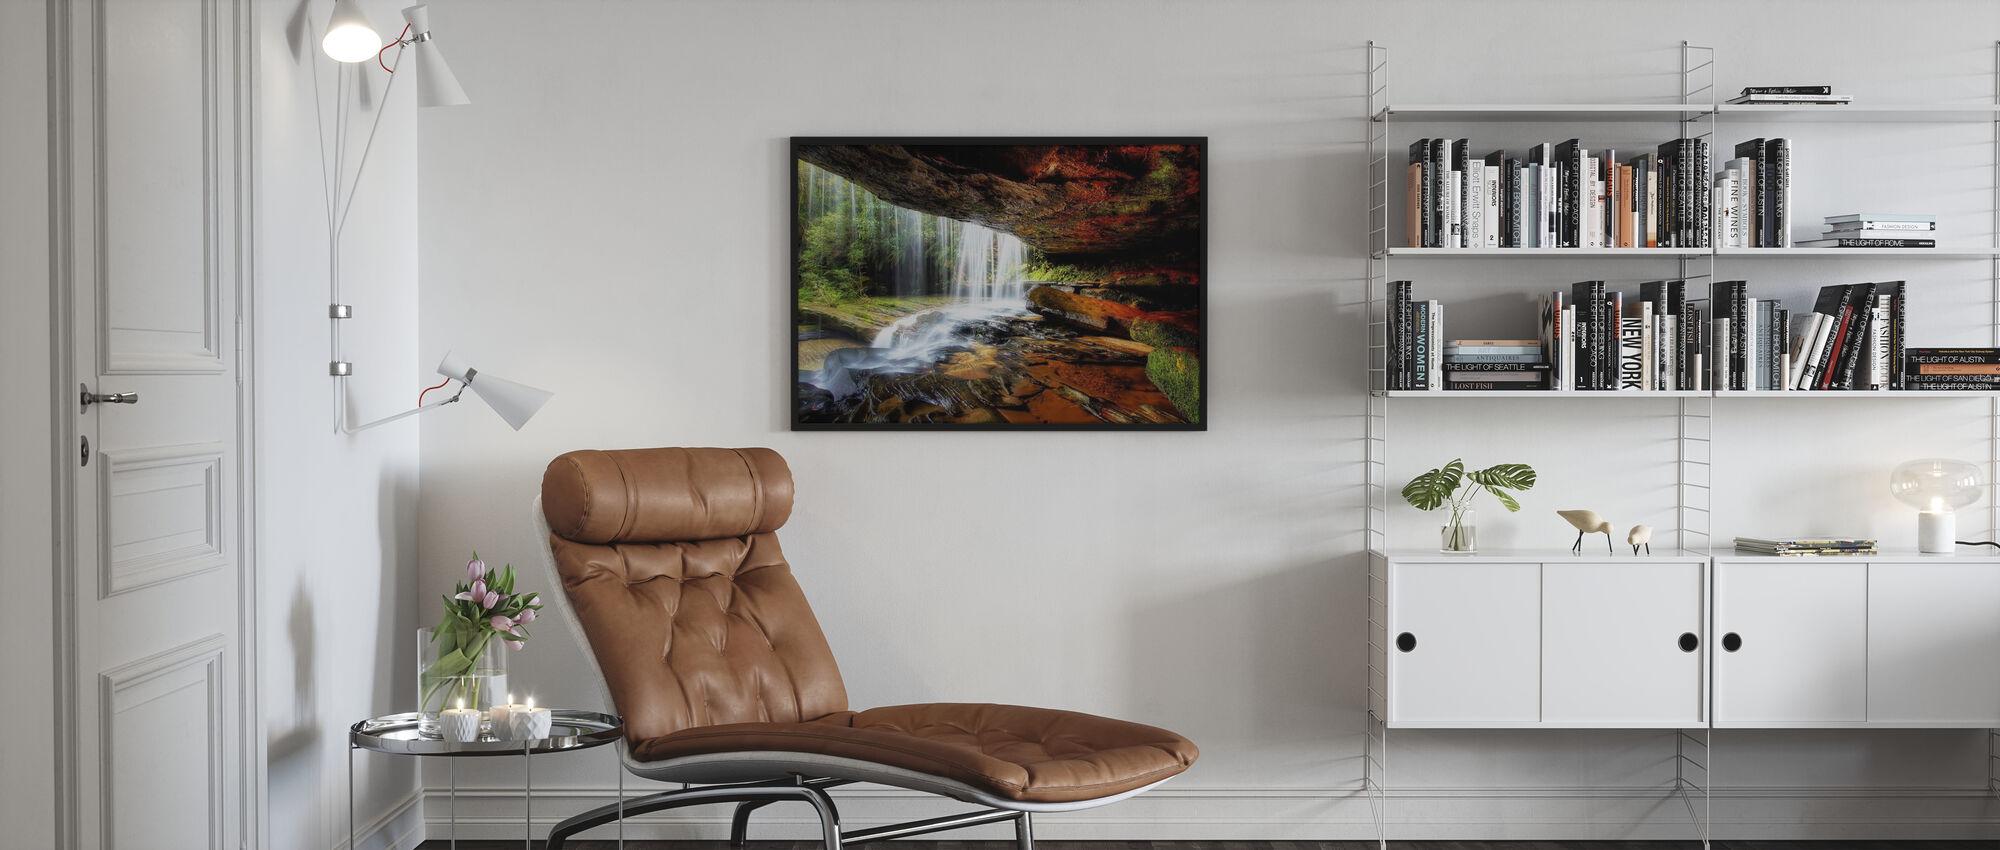 Under the Ledge - Poster - Living Room